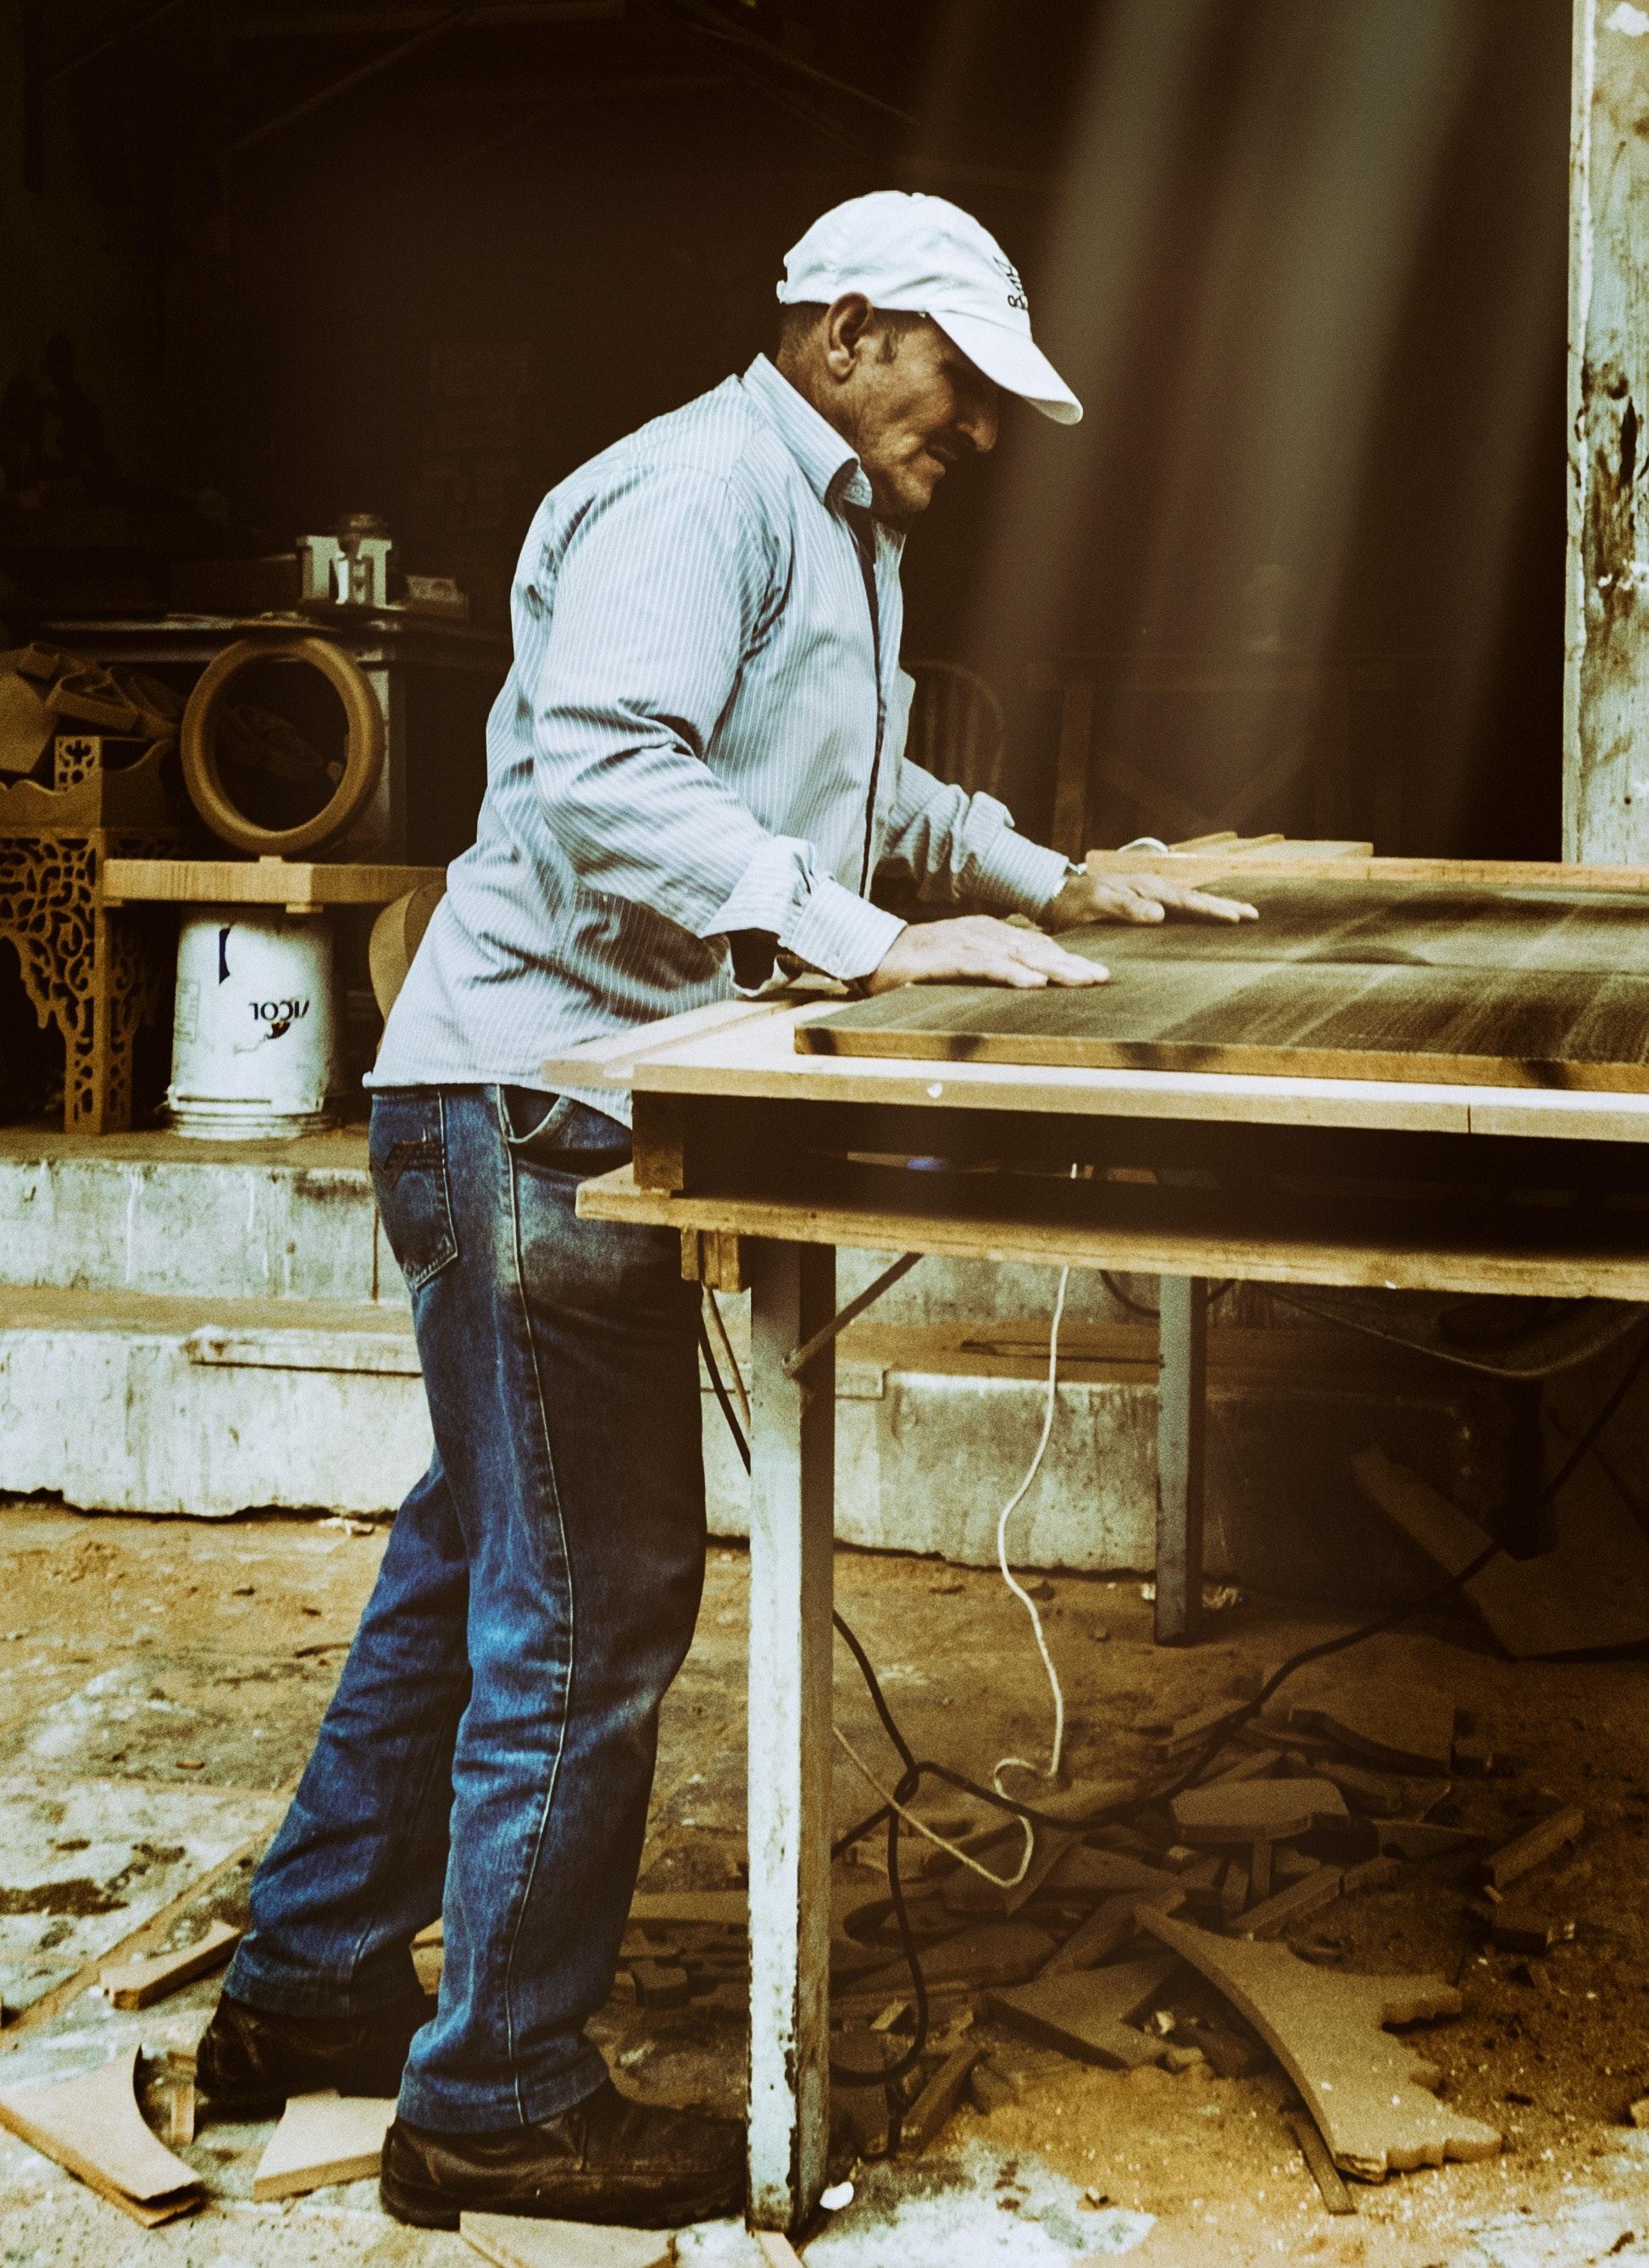 Carpentry Carpenter Woodworker Woodworking Wooden: Free Stock Photo Of Carpenter, Carpenter Cutting, Carpentry